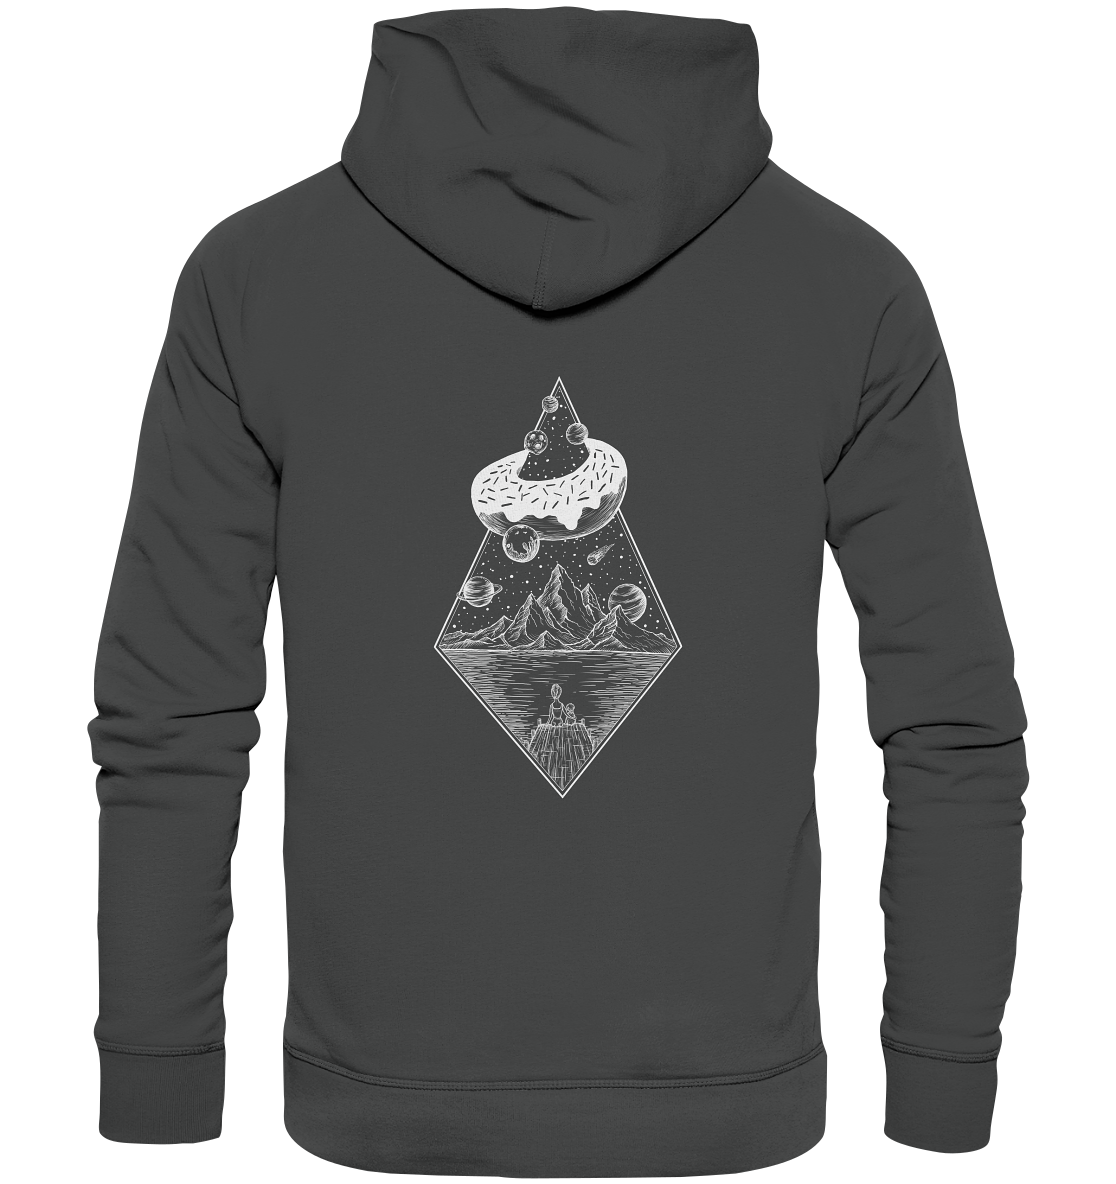 back-organic-fashion-hoodie-444545-1116x.png